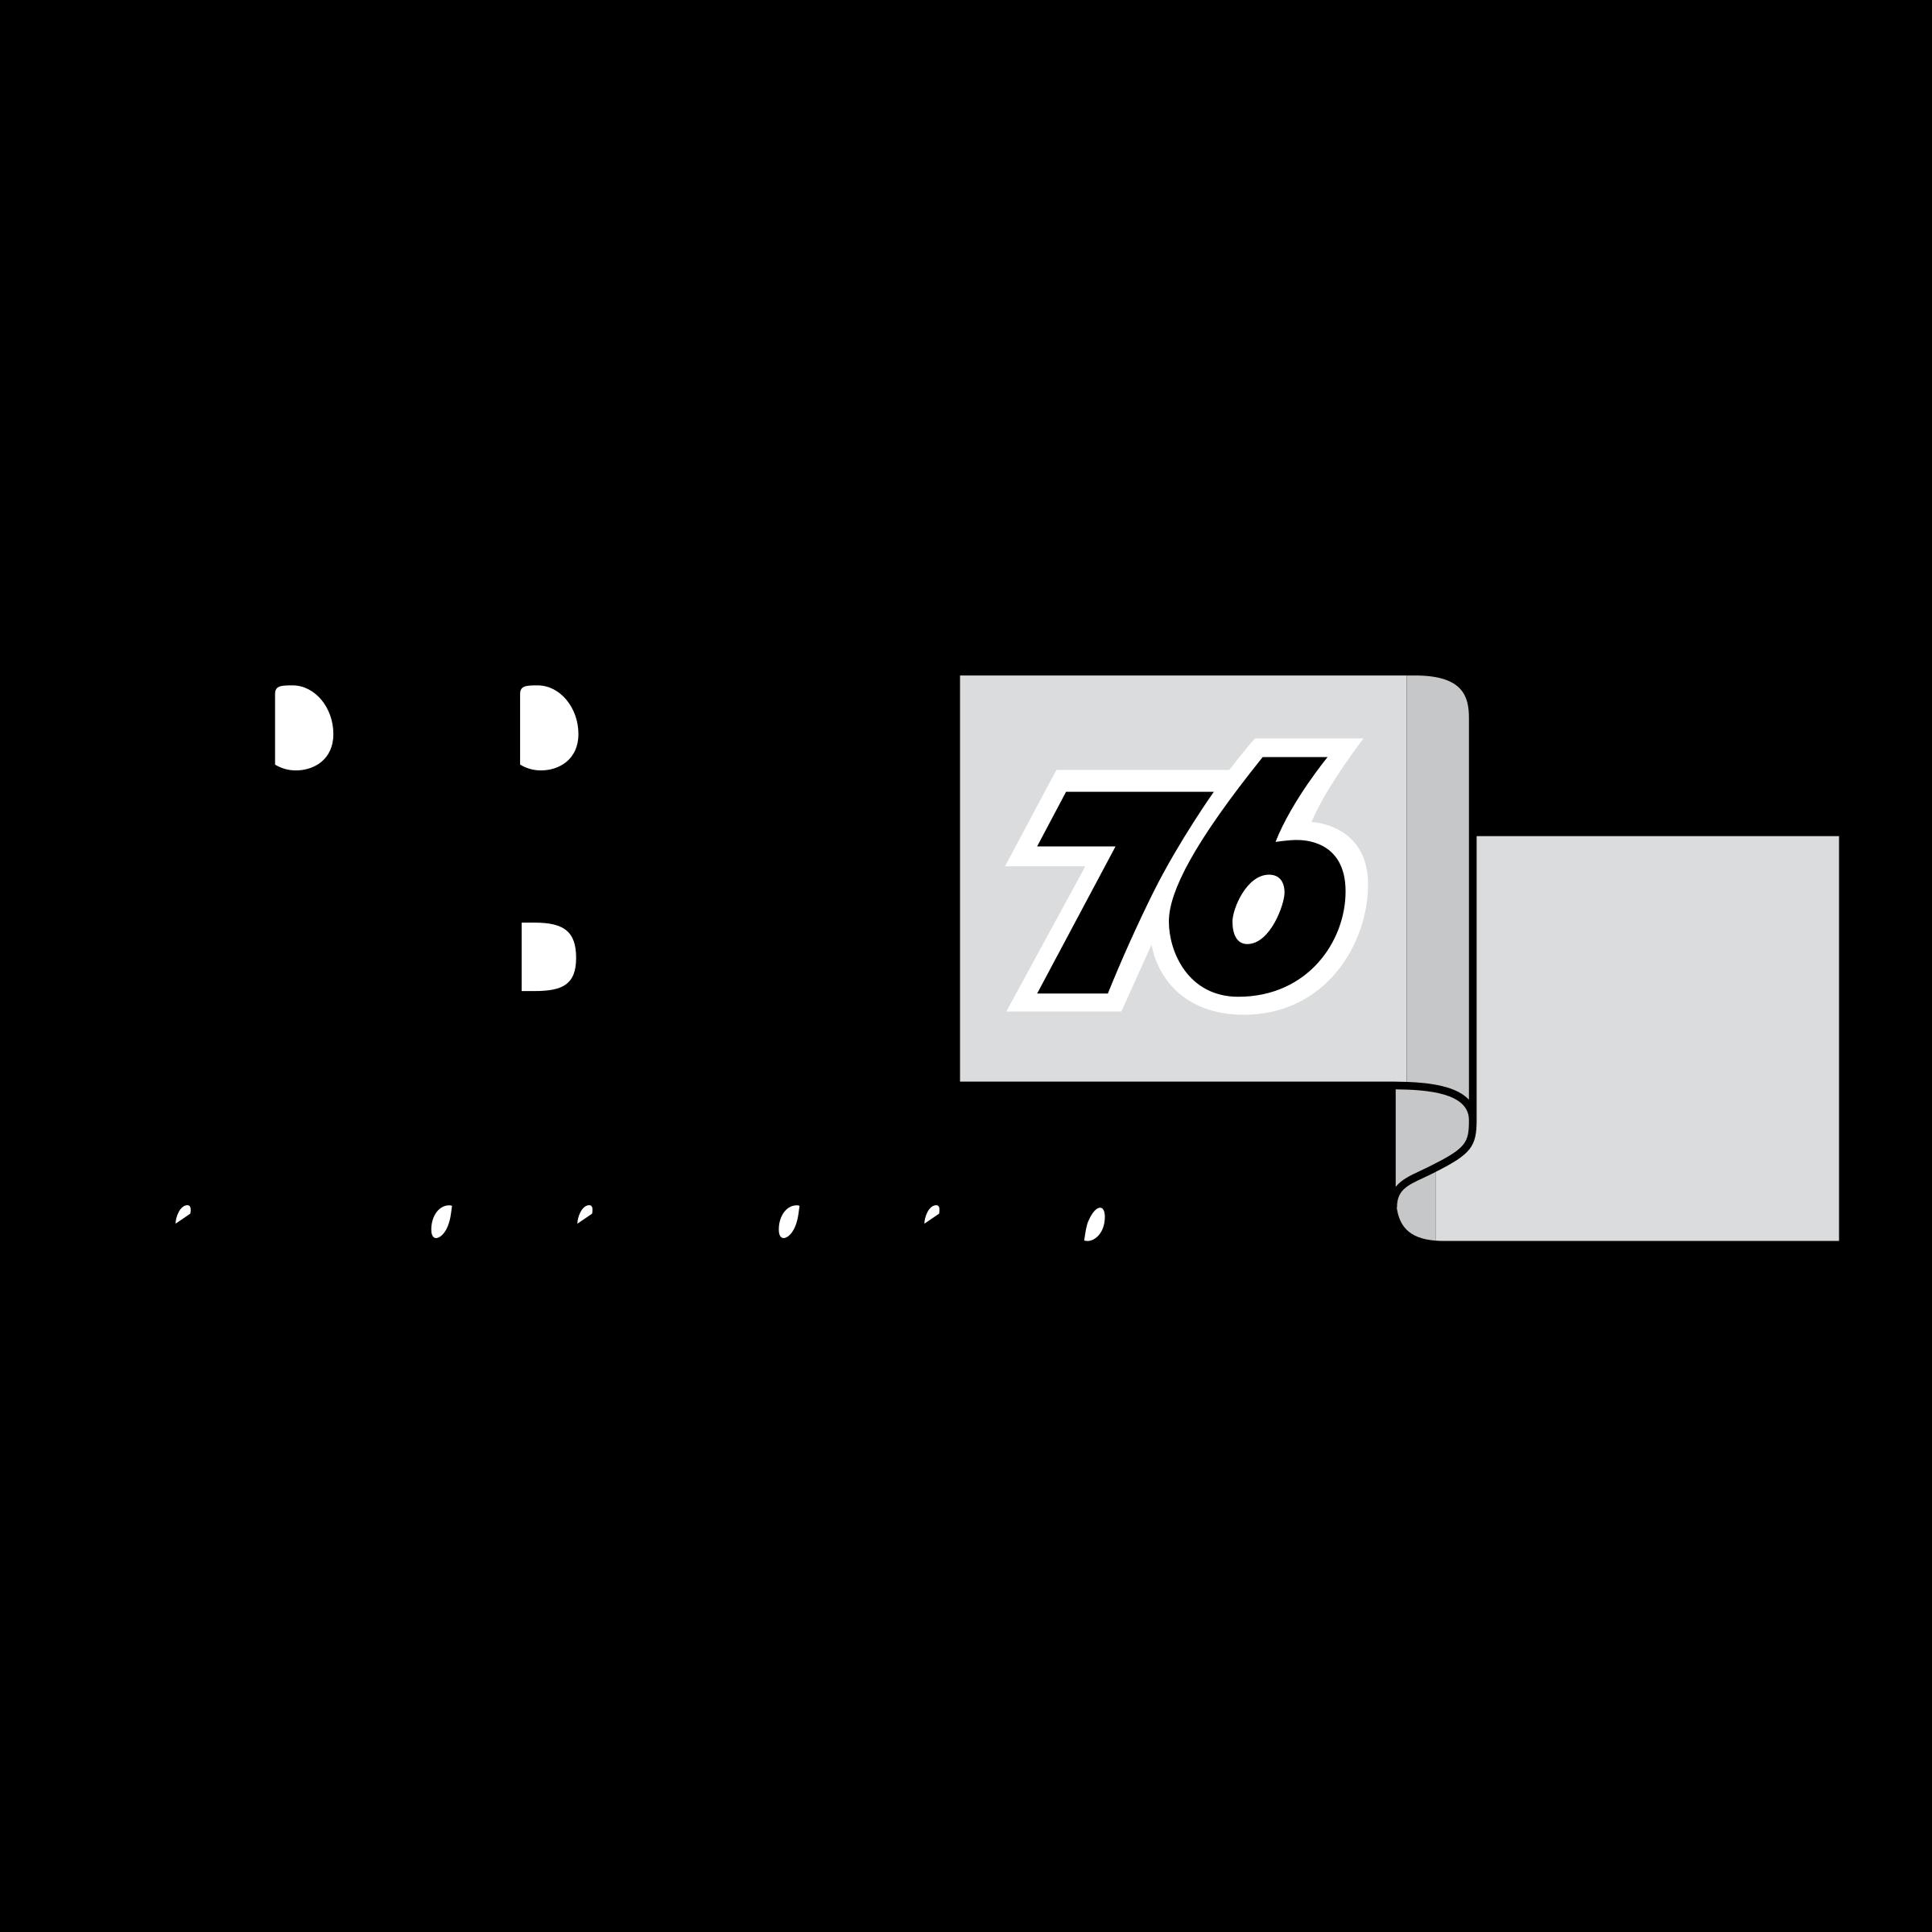 Spirit Energy Logo PNG Transparent & SVG Vector - Freebie Supply